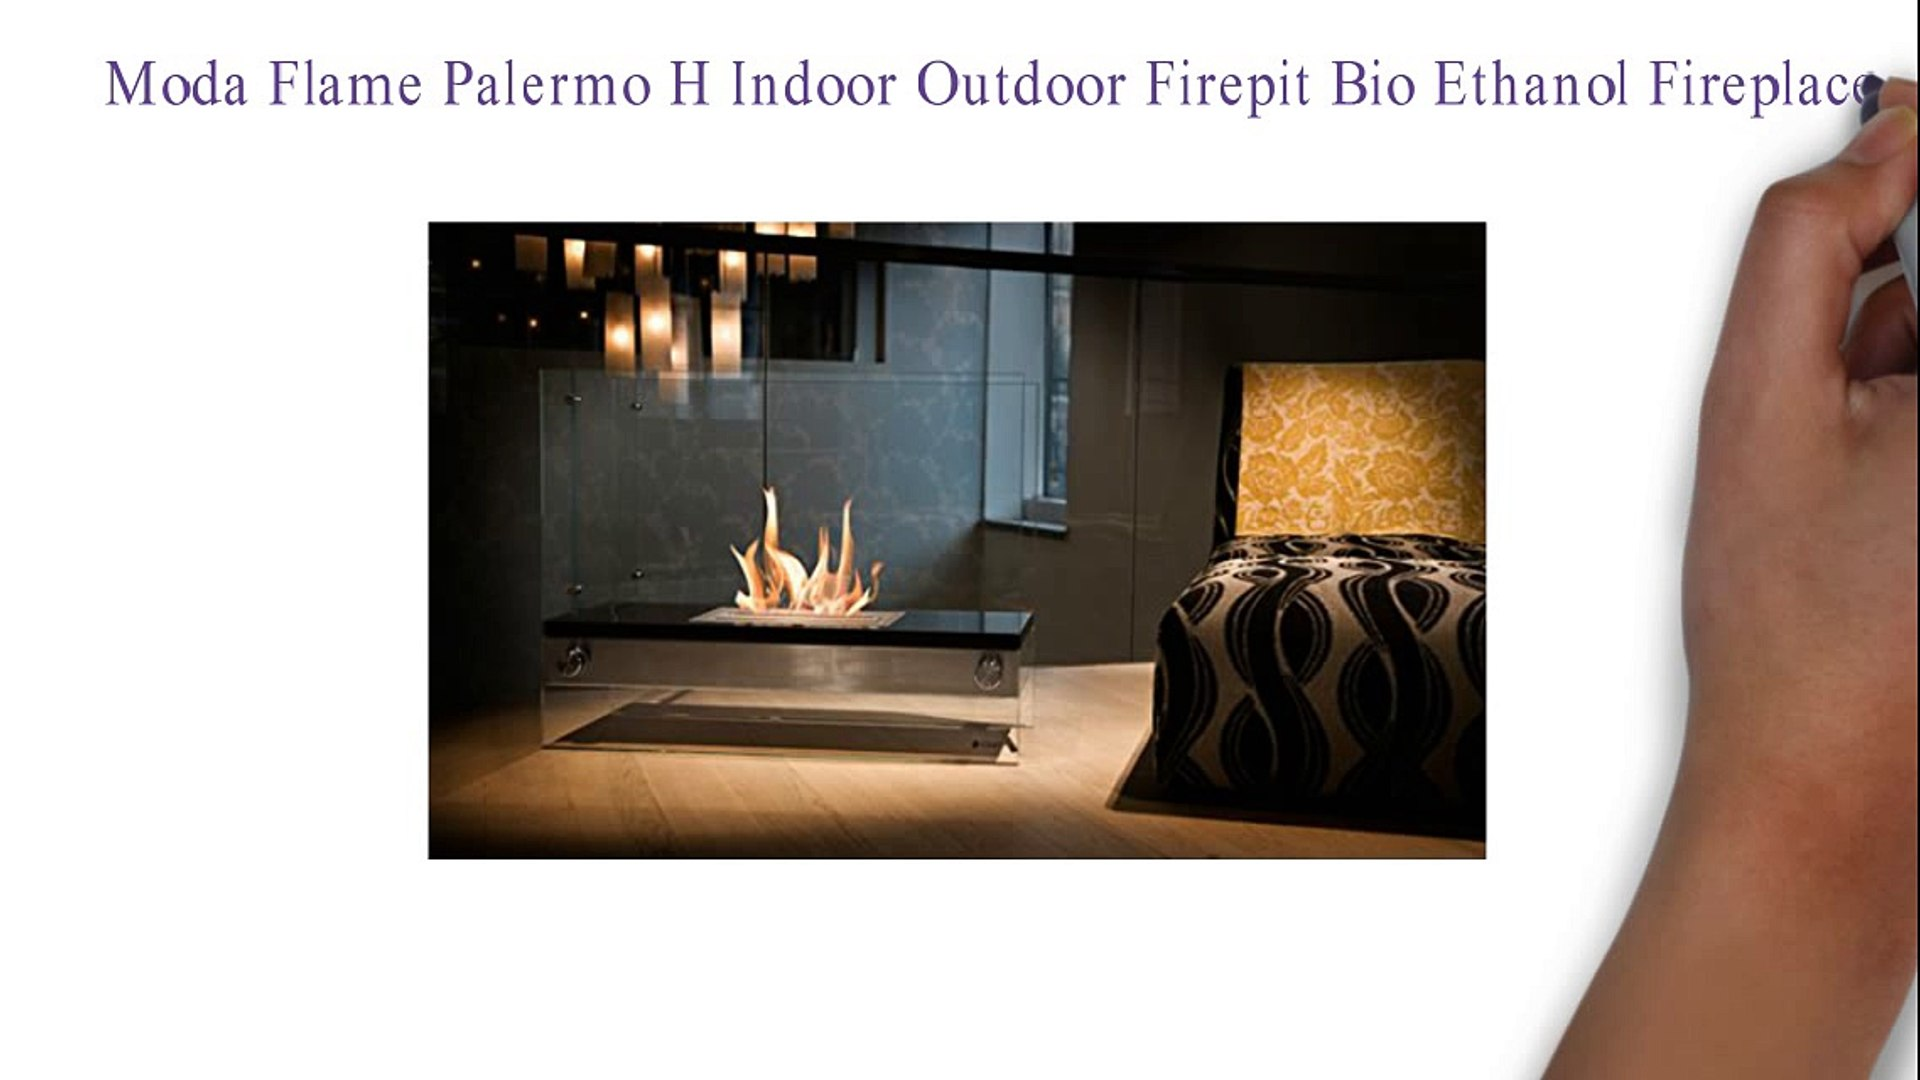 Moda Flame Palermo H Indoor Outdoor Firepit Bio Ethanol Fireplace